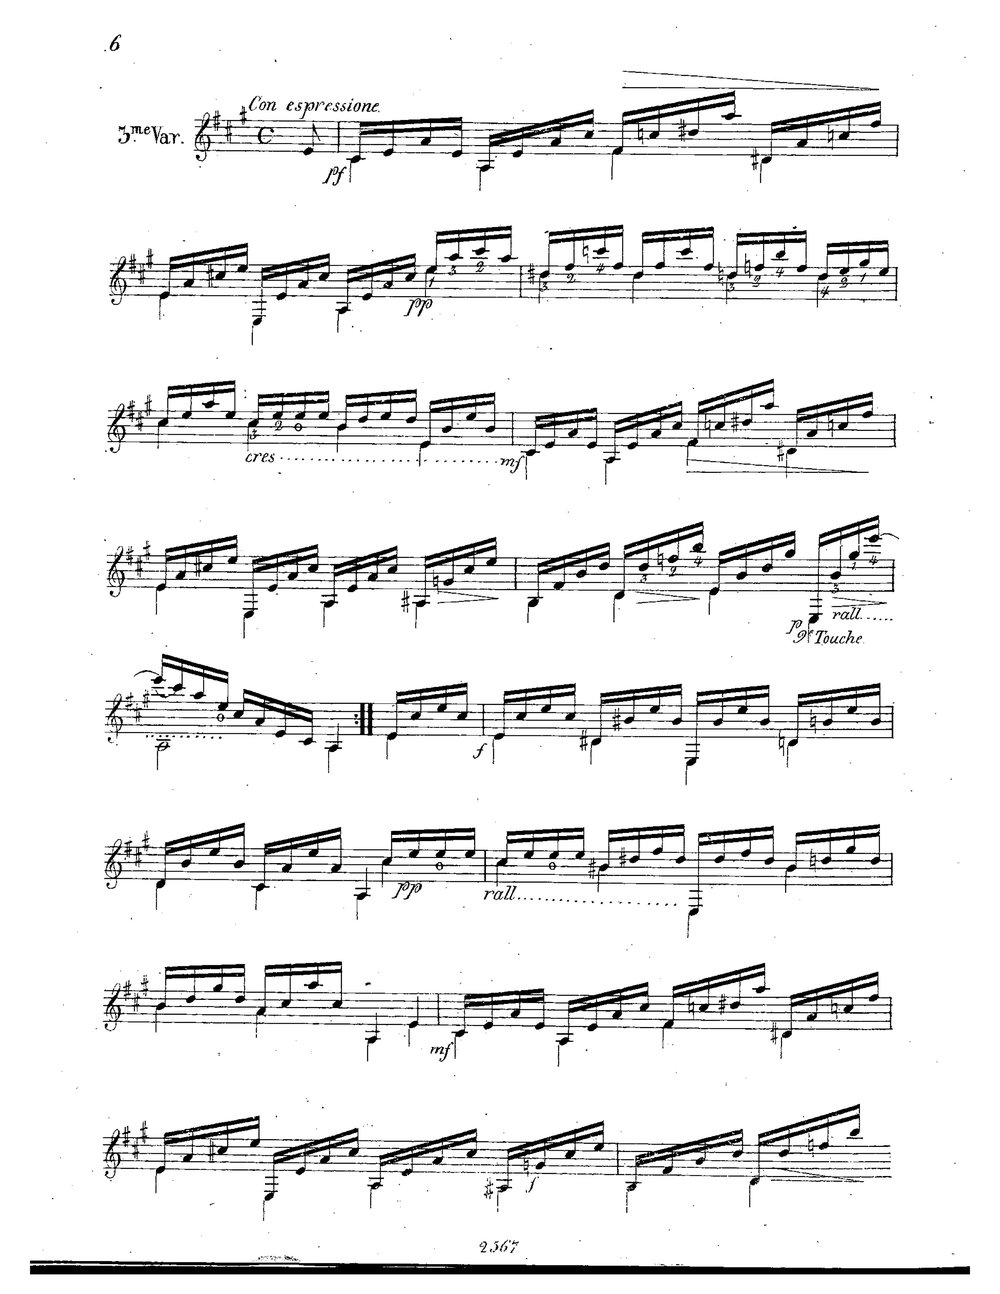 Air Suisse varié, Op.20 (Carcassi, Matteo)5.jpg